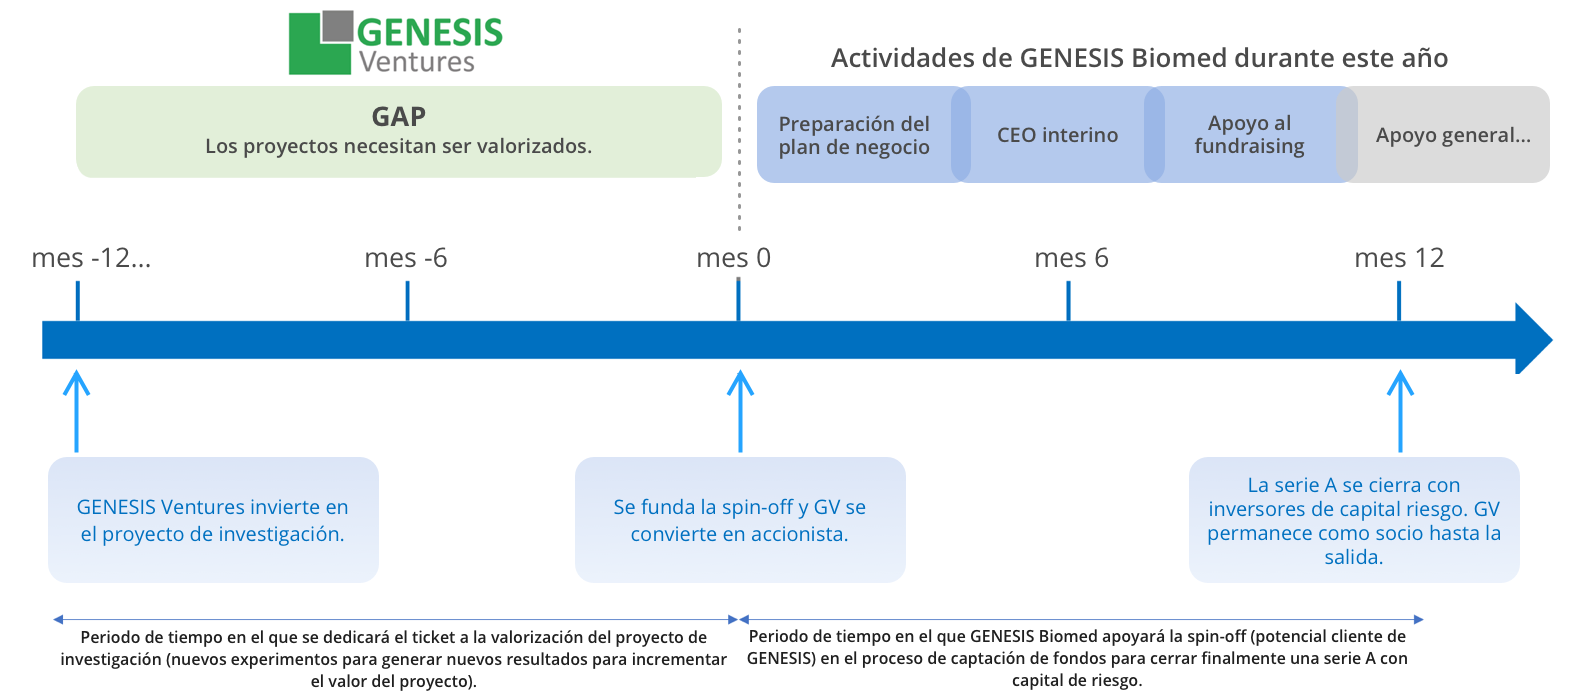 Genesis Ventures